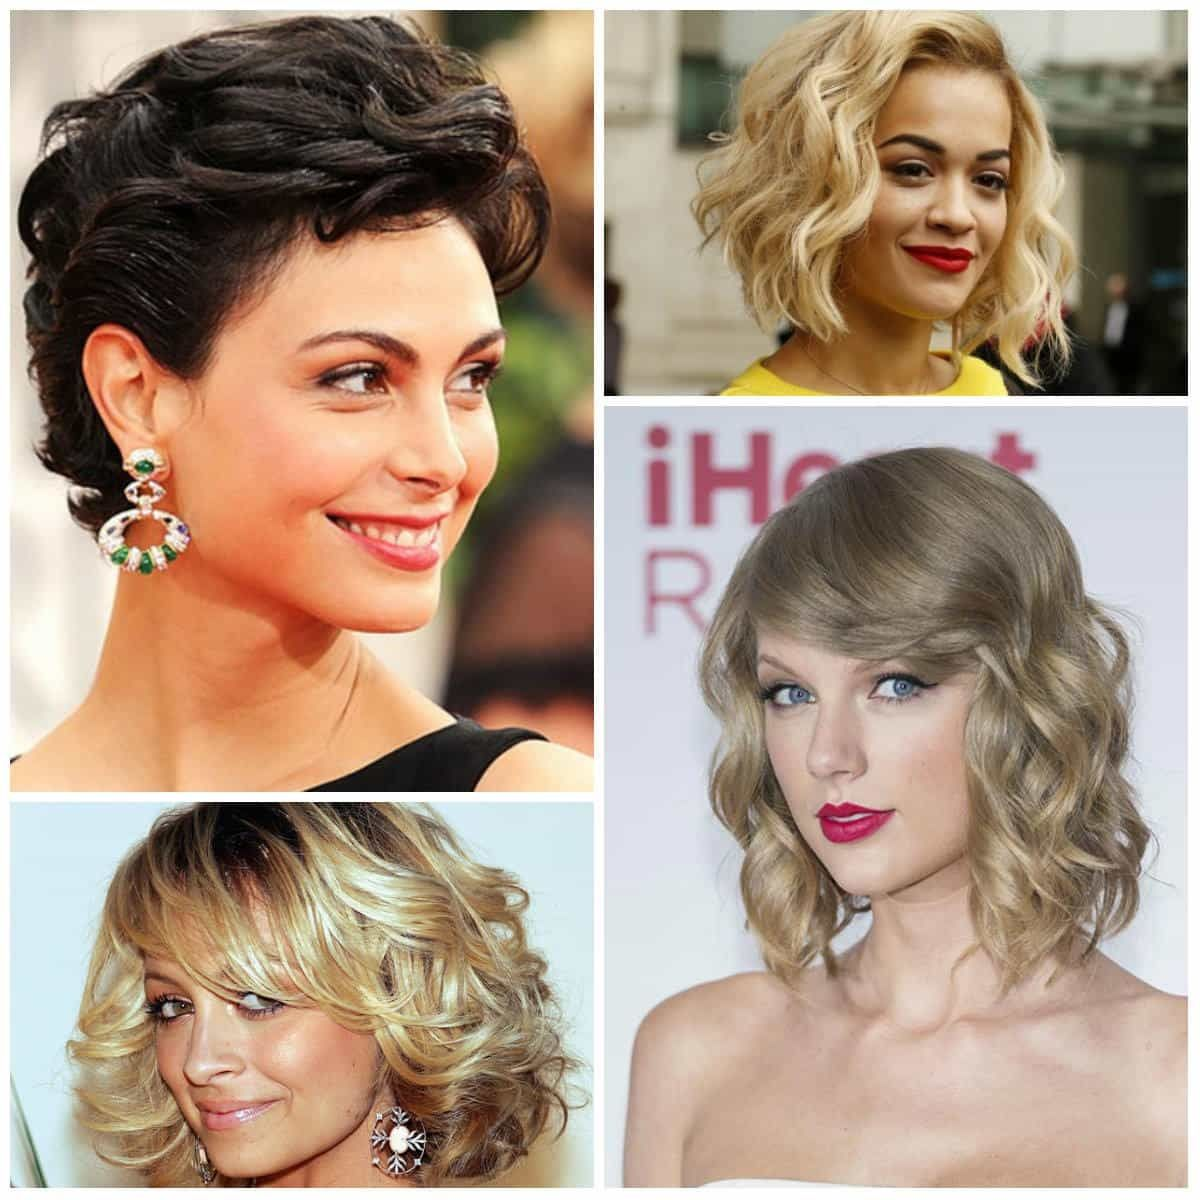 Short Curly Hairstyles 2017 Hair Curly Hair Cuts Short